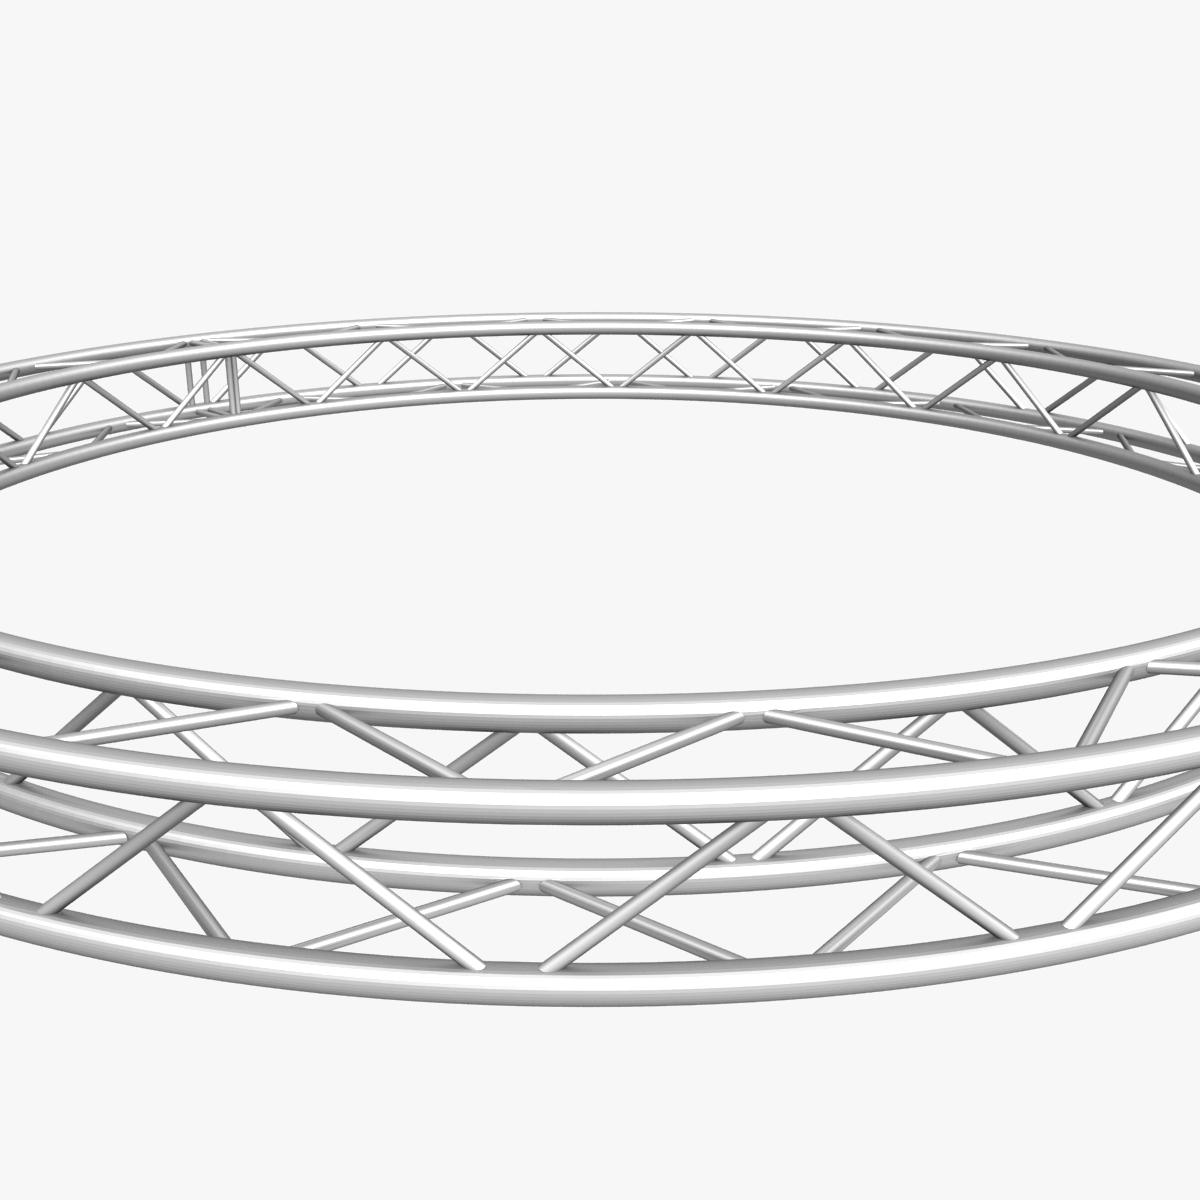 circle square truss (400cm) 3d model max fbx obj 218636